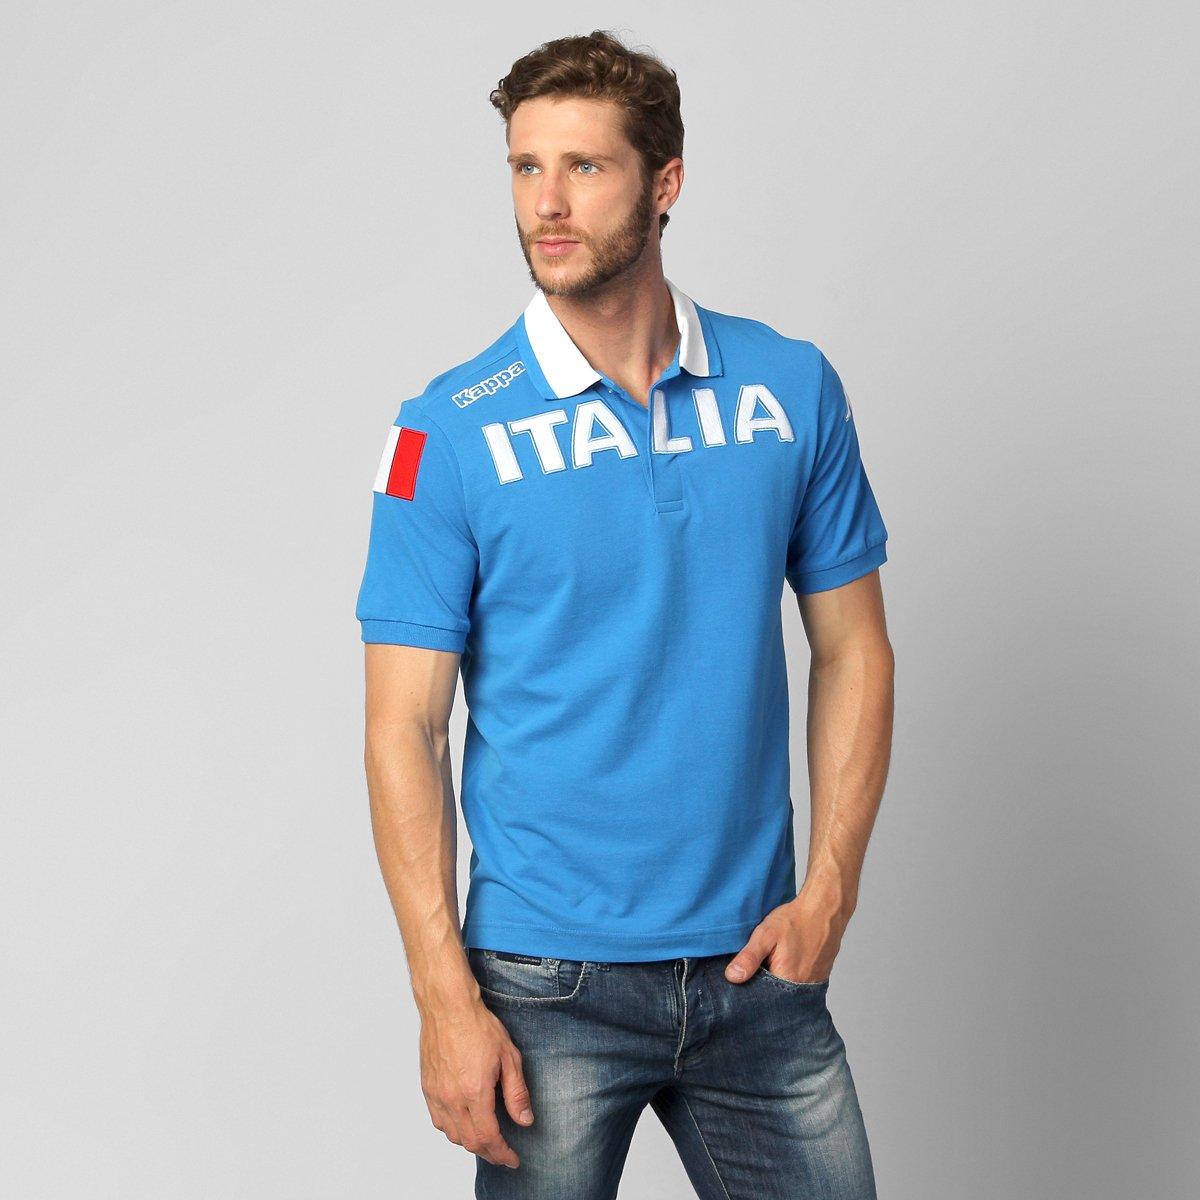 Camisa Polo Kappa Eroi Itália - Compre Agora  6e014a680db45